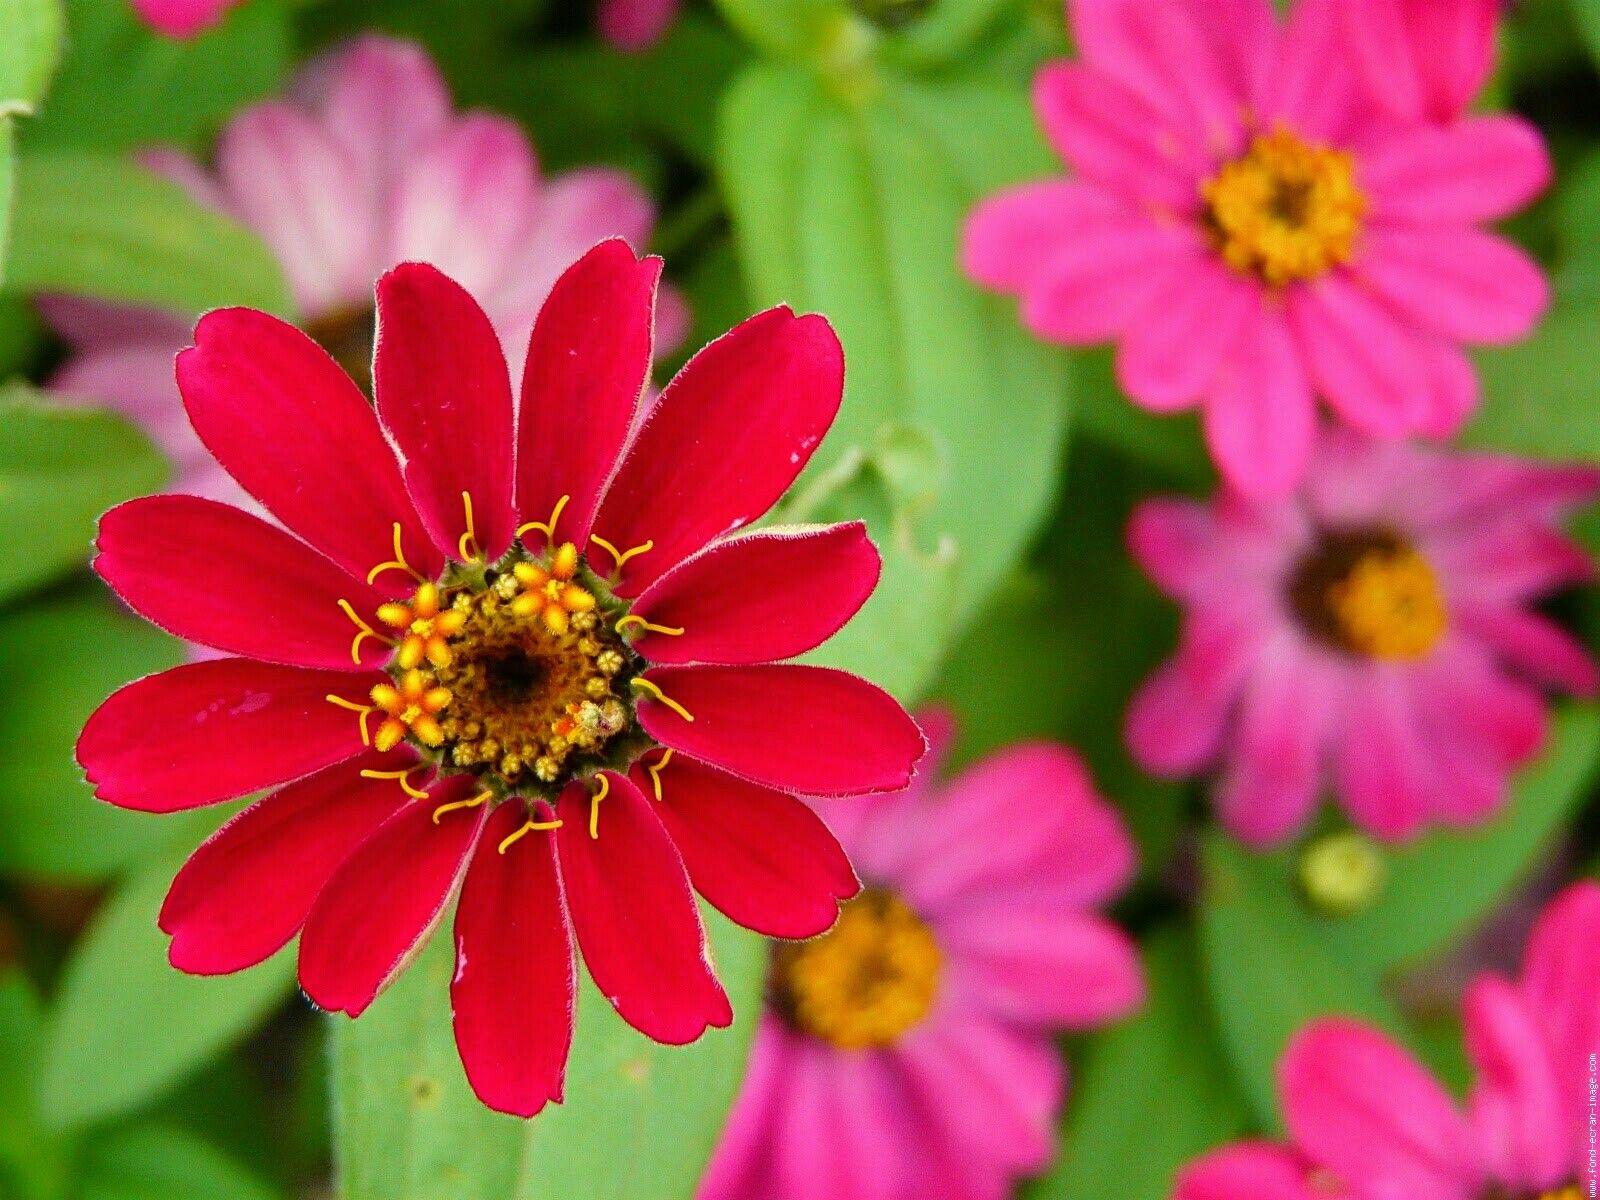 Pin by sahhouma abdellaoui on fleurs pinterest flowers flowers izmirmasajfo